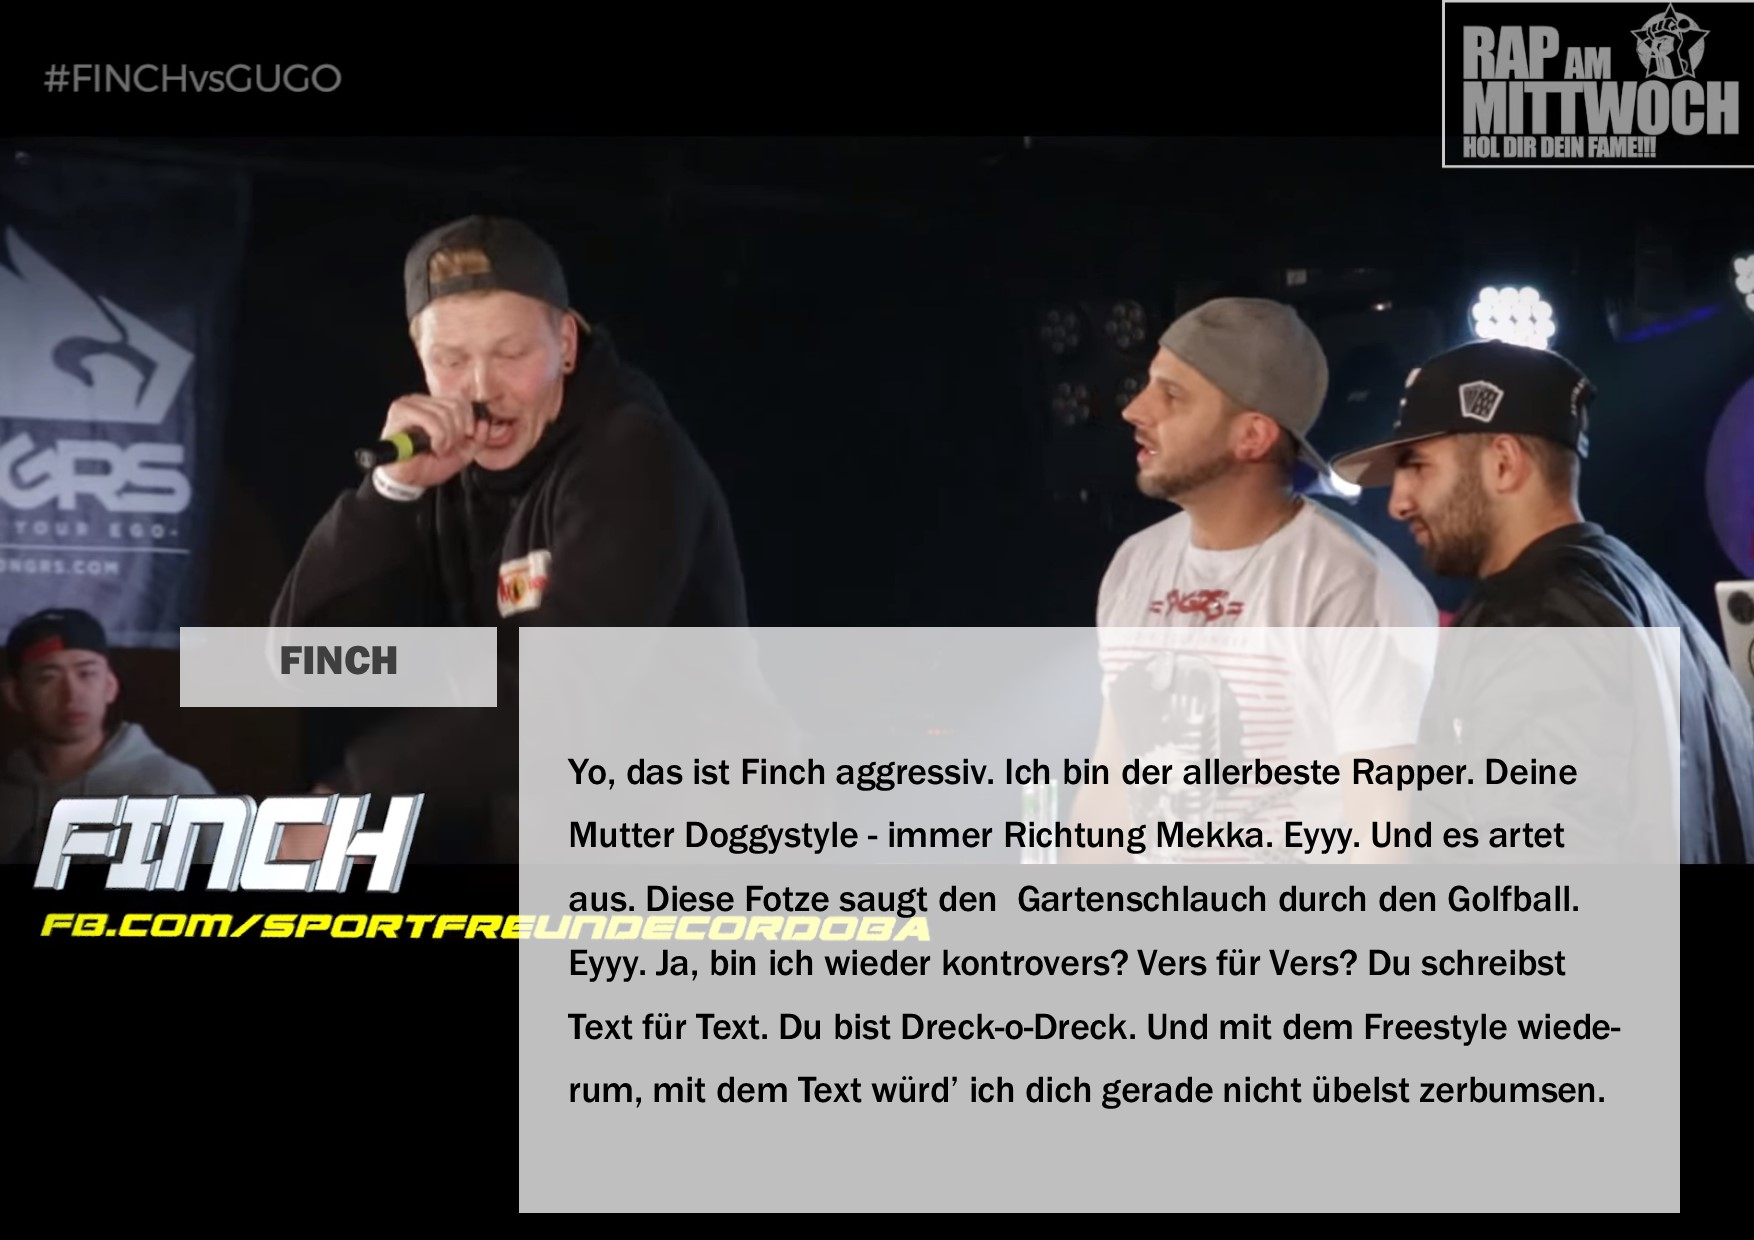 Gugo-vs-Finch-4